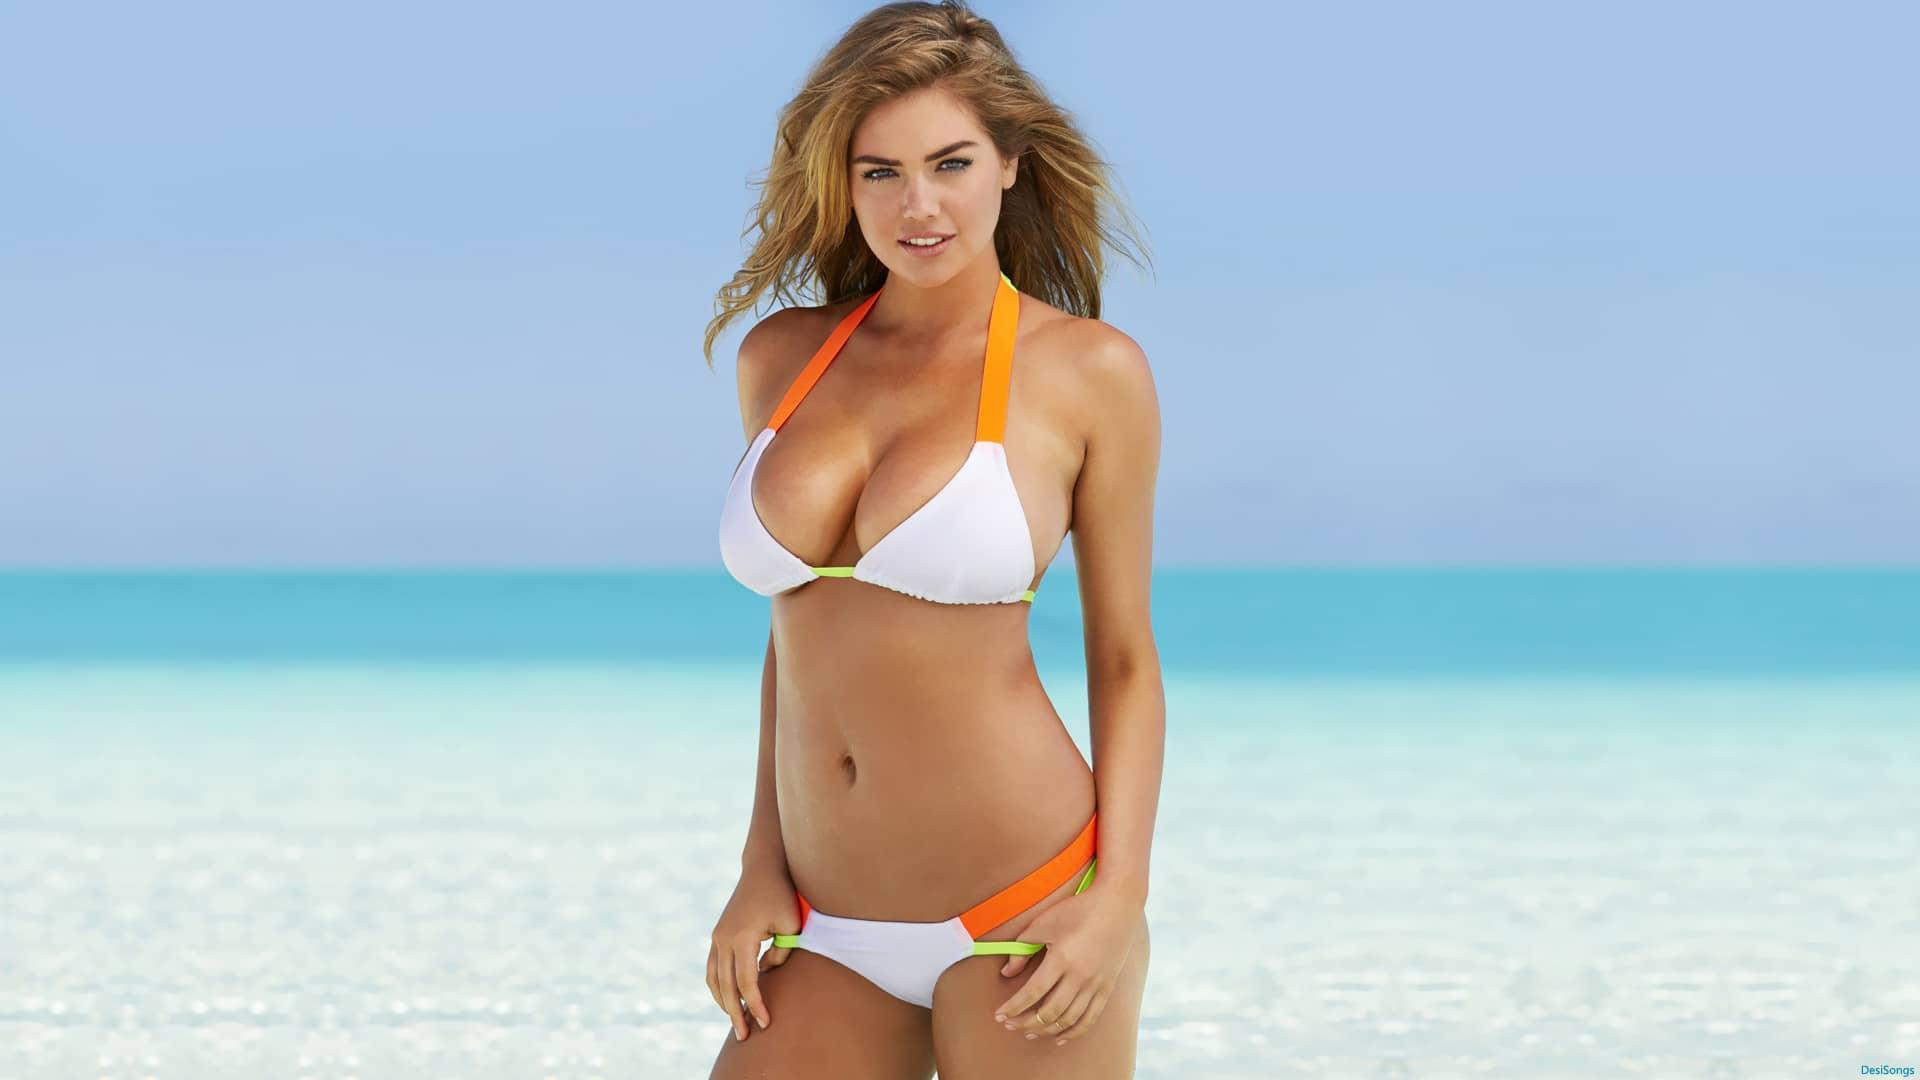 Hot bikini girls wallpaper, free girl nu